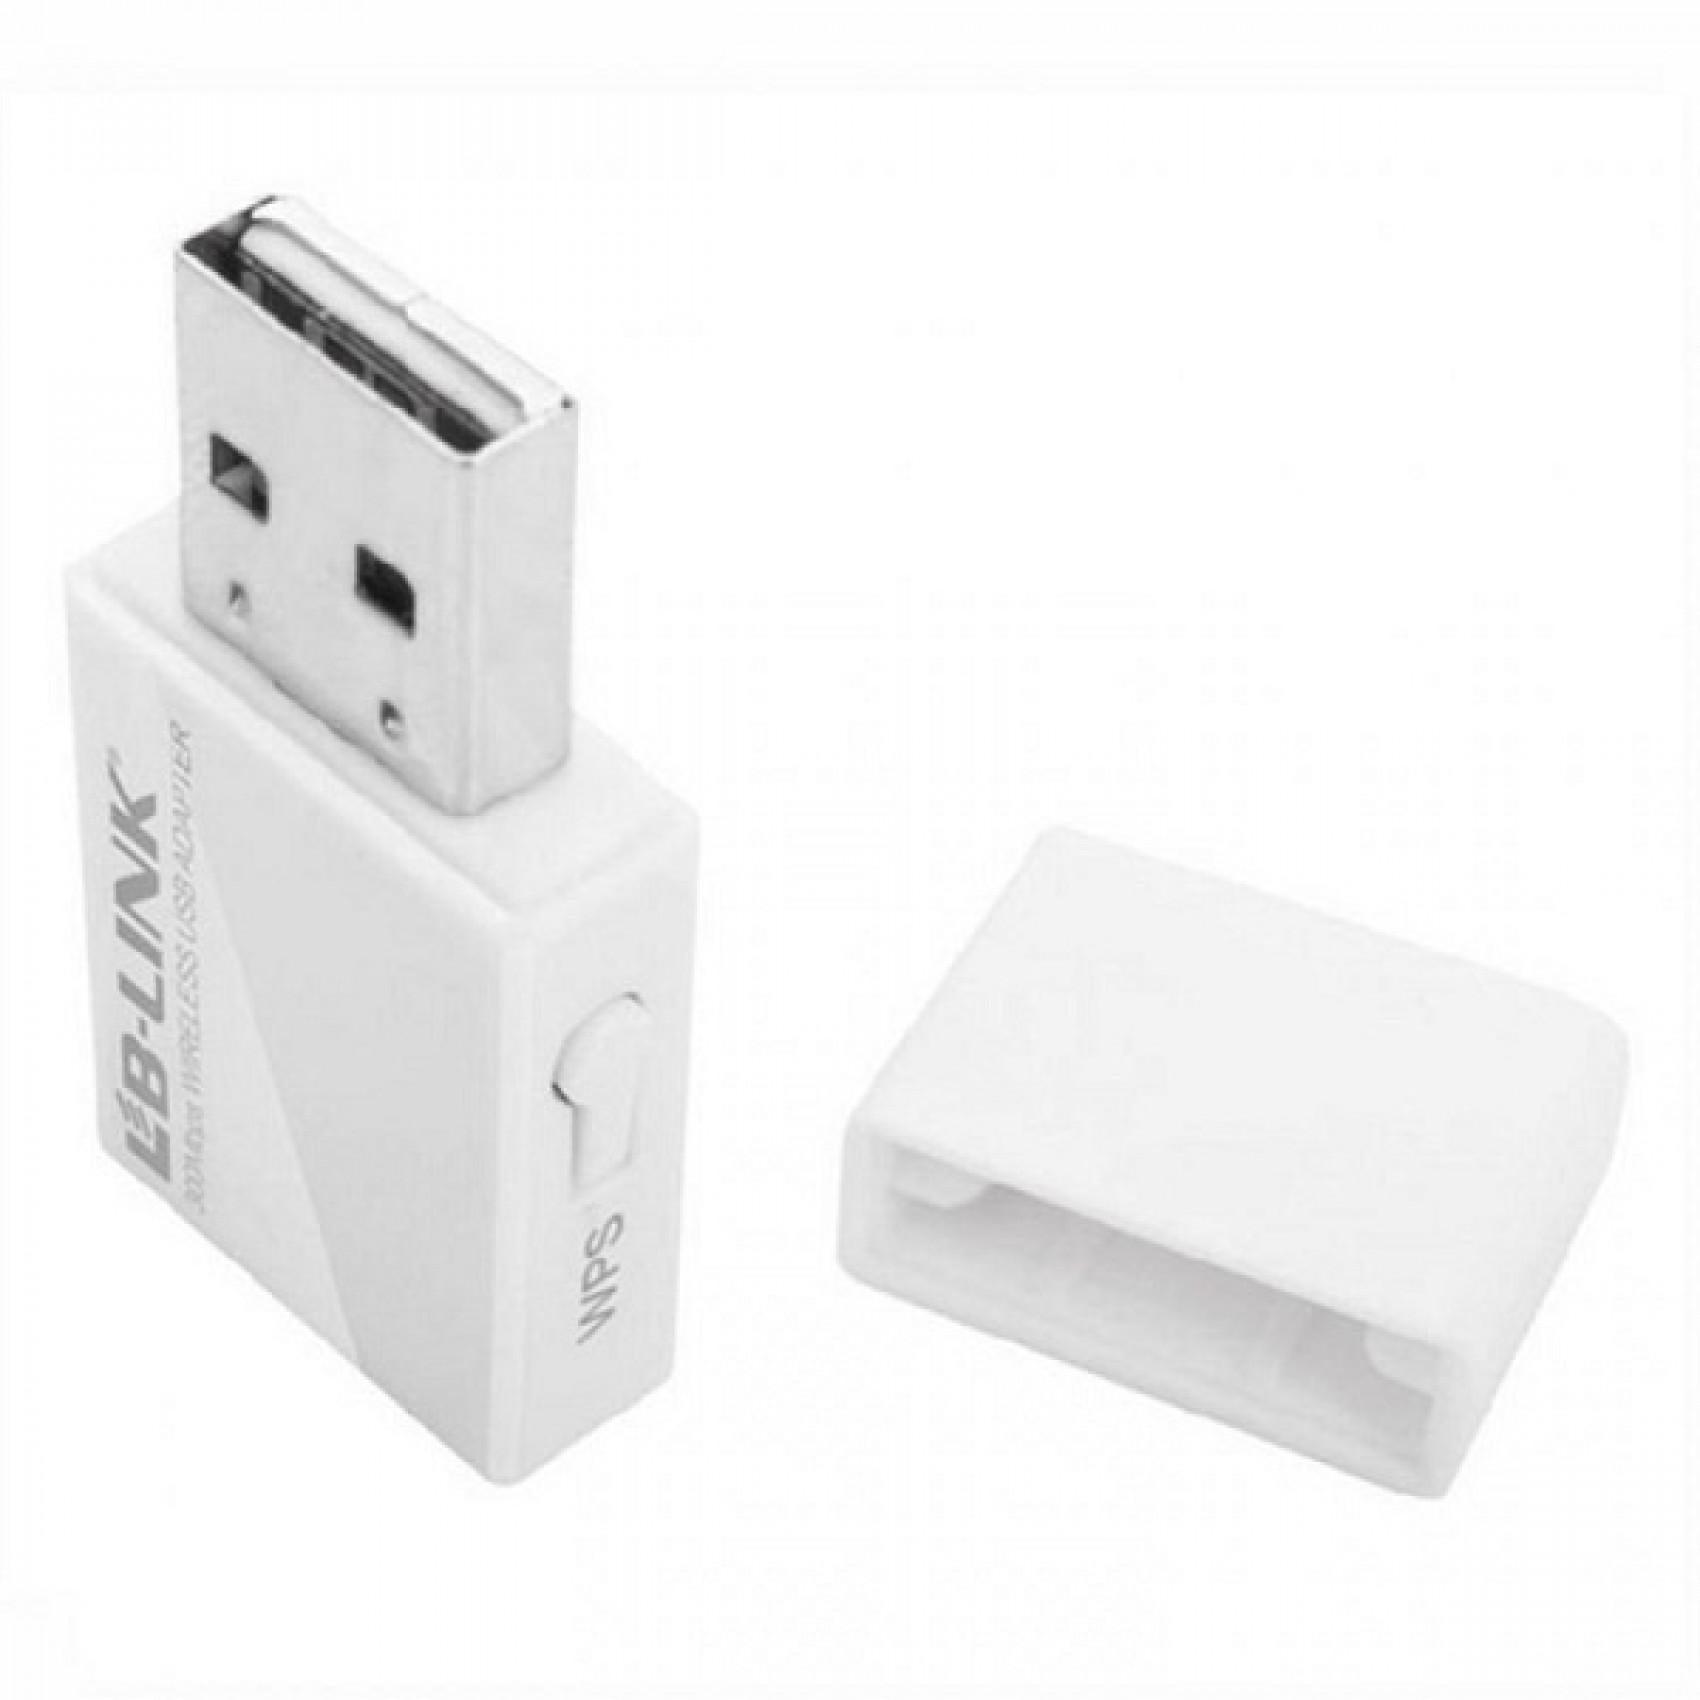 USB WiFi b/g/n mini dongle (BL-WN2210)